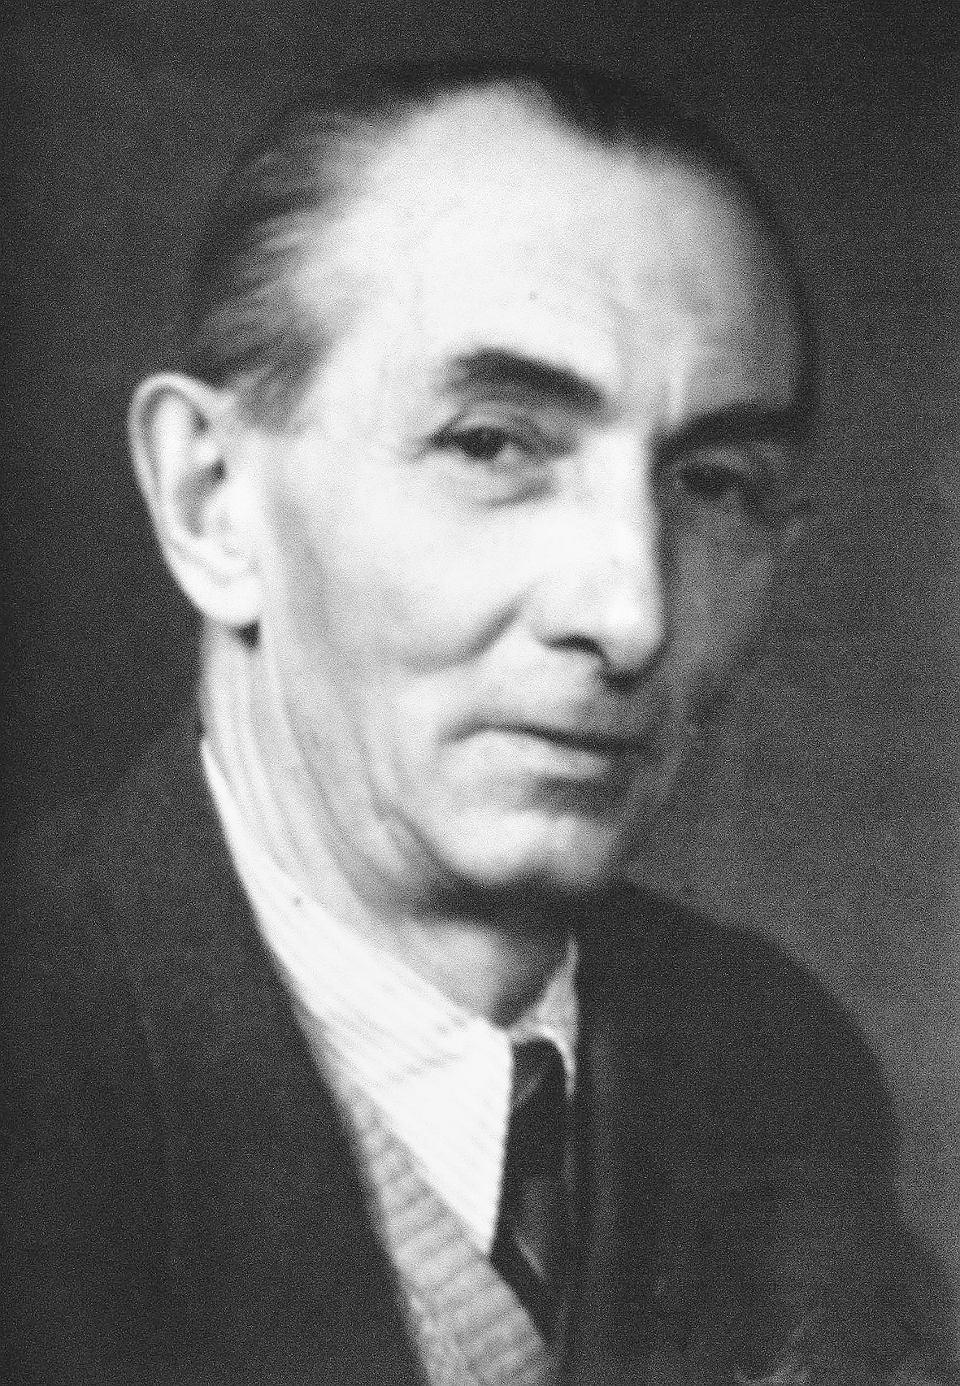 Aleksander Semkowicz